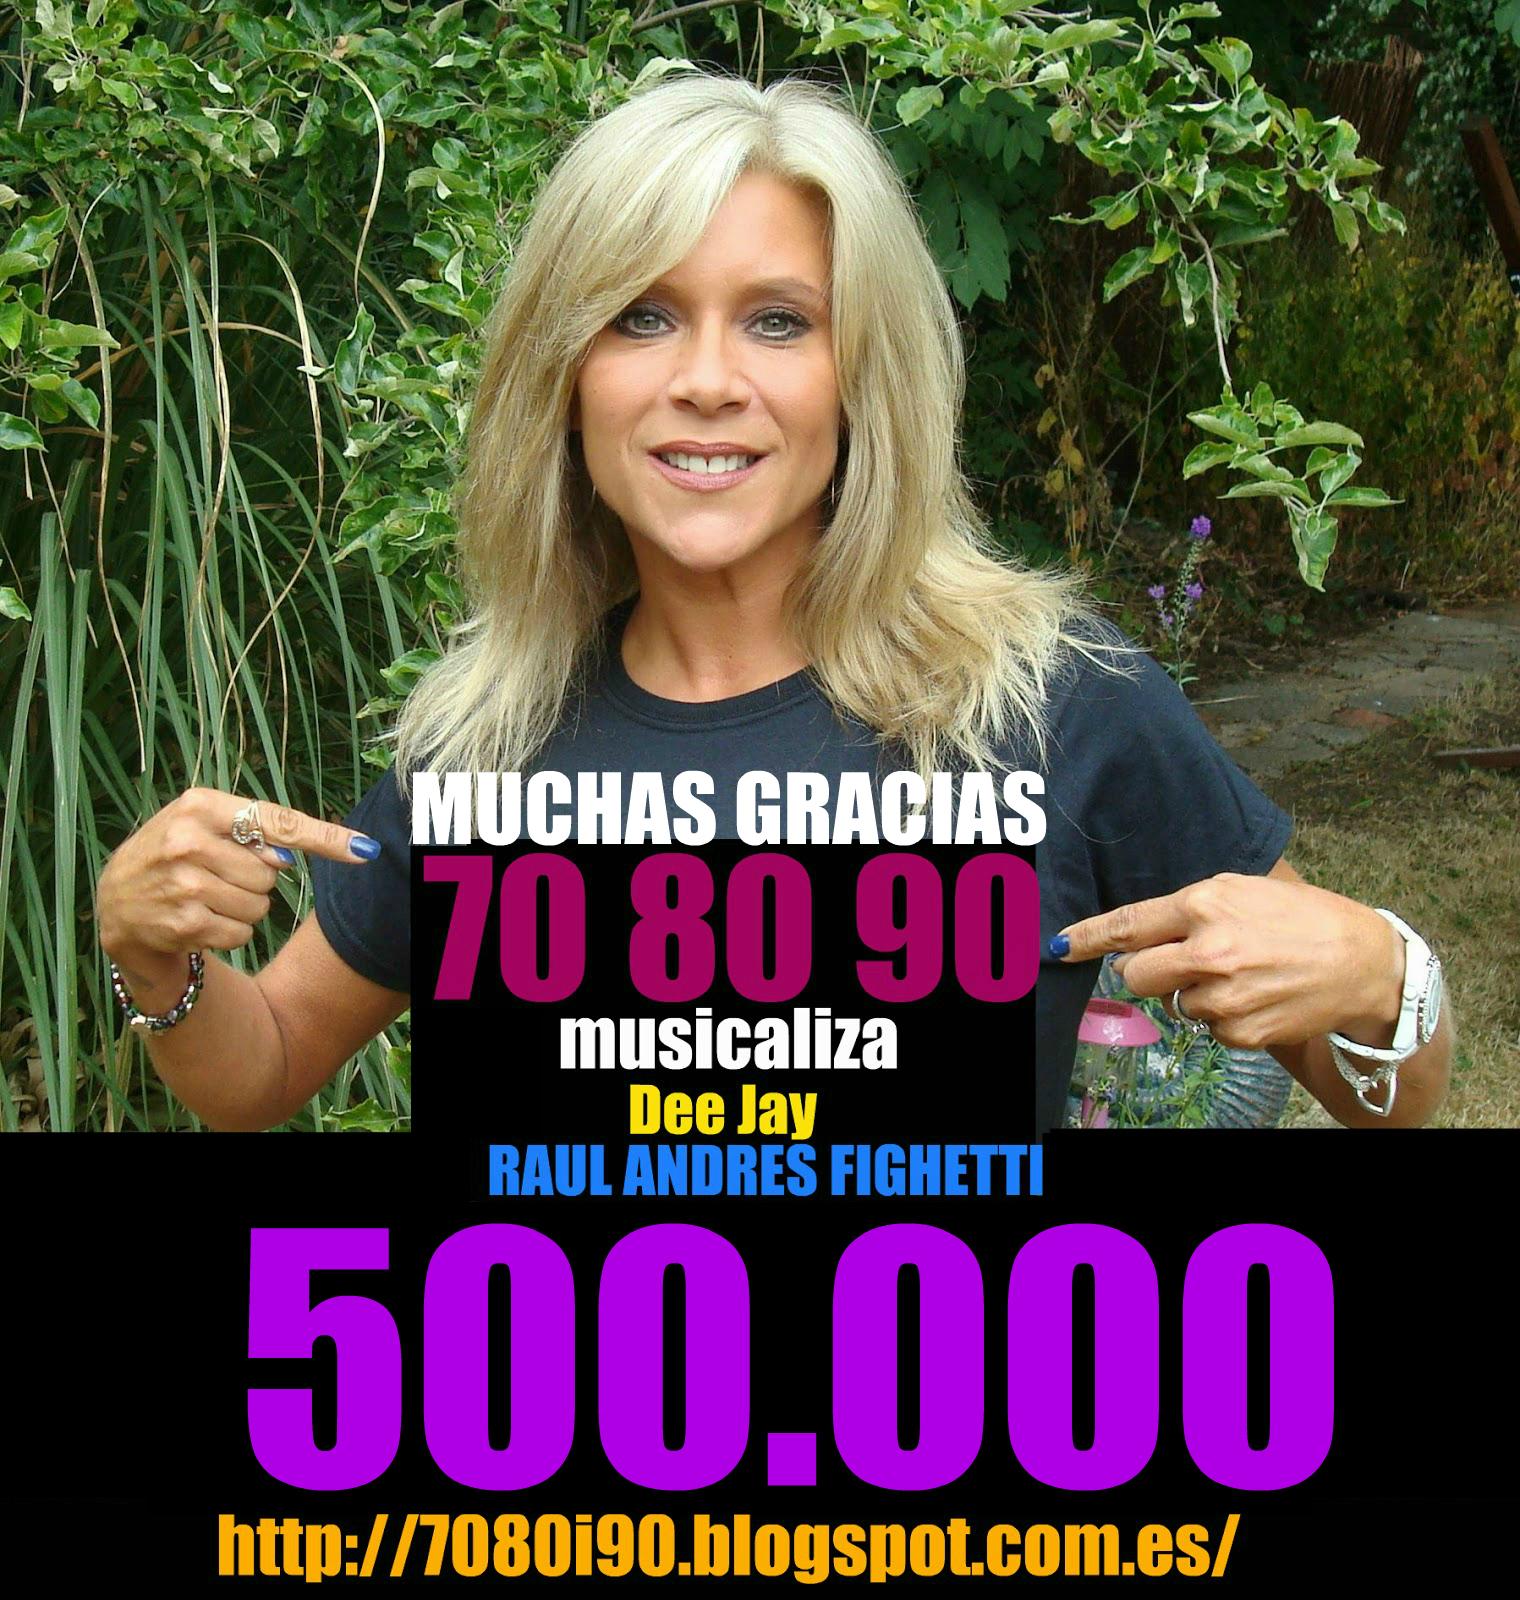 500.000 PAGINAS VISTAS